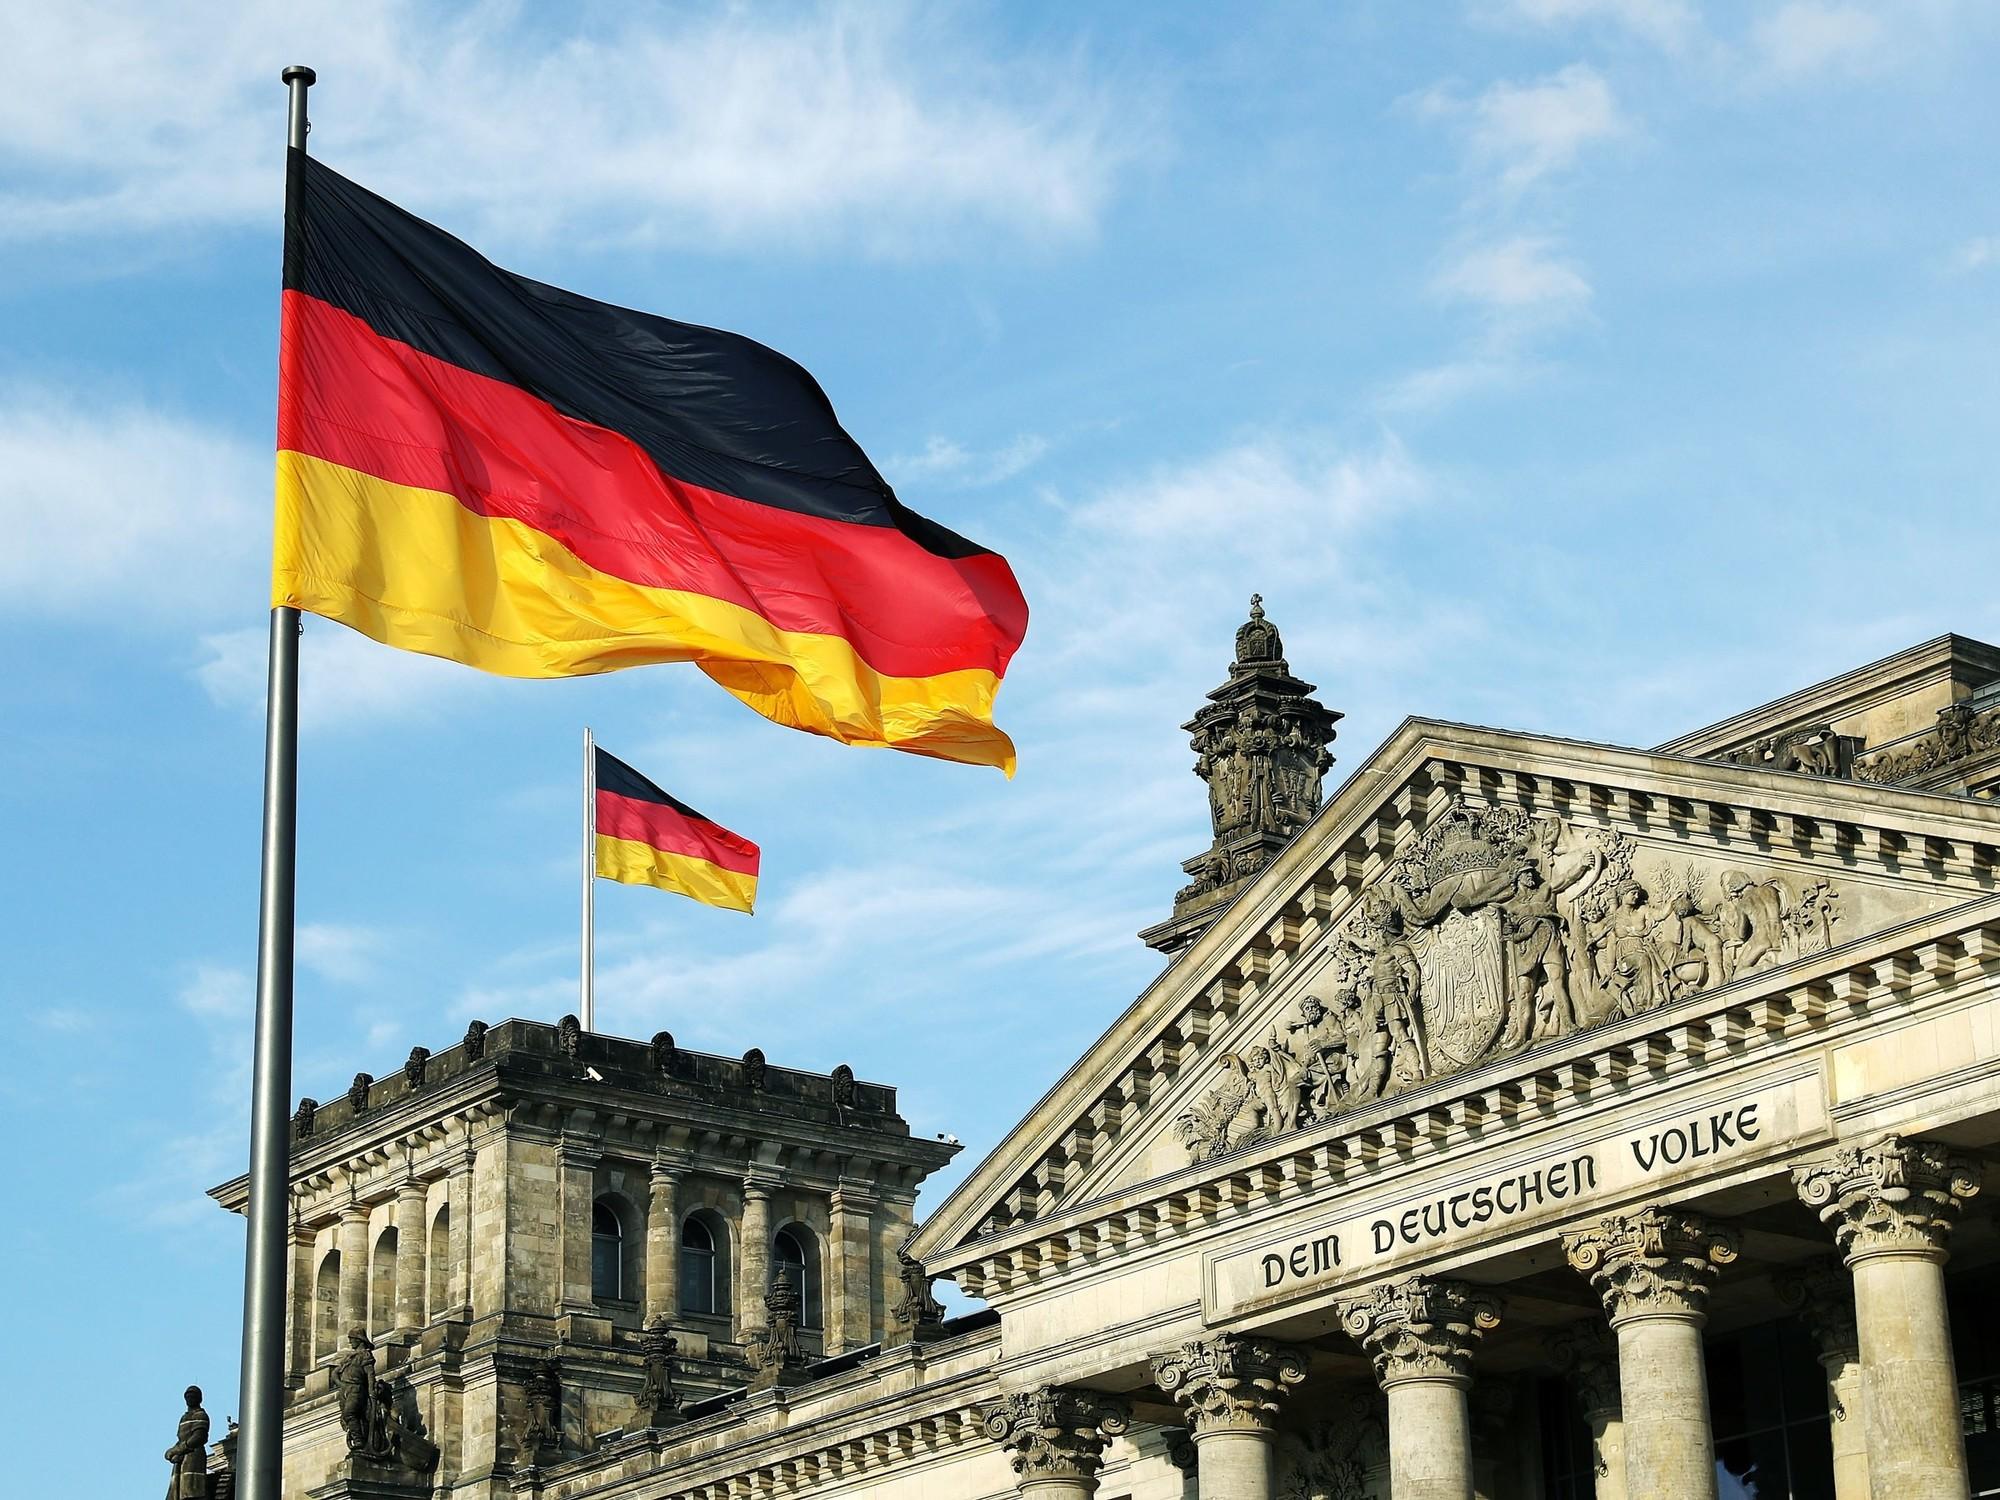 GermanFlag-TA-843187700.thumb.jpg.bed3e2337c101ac1f51608e02967ad29.jpg